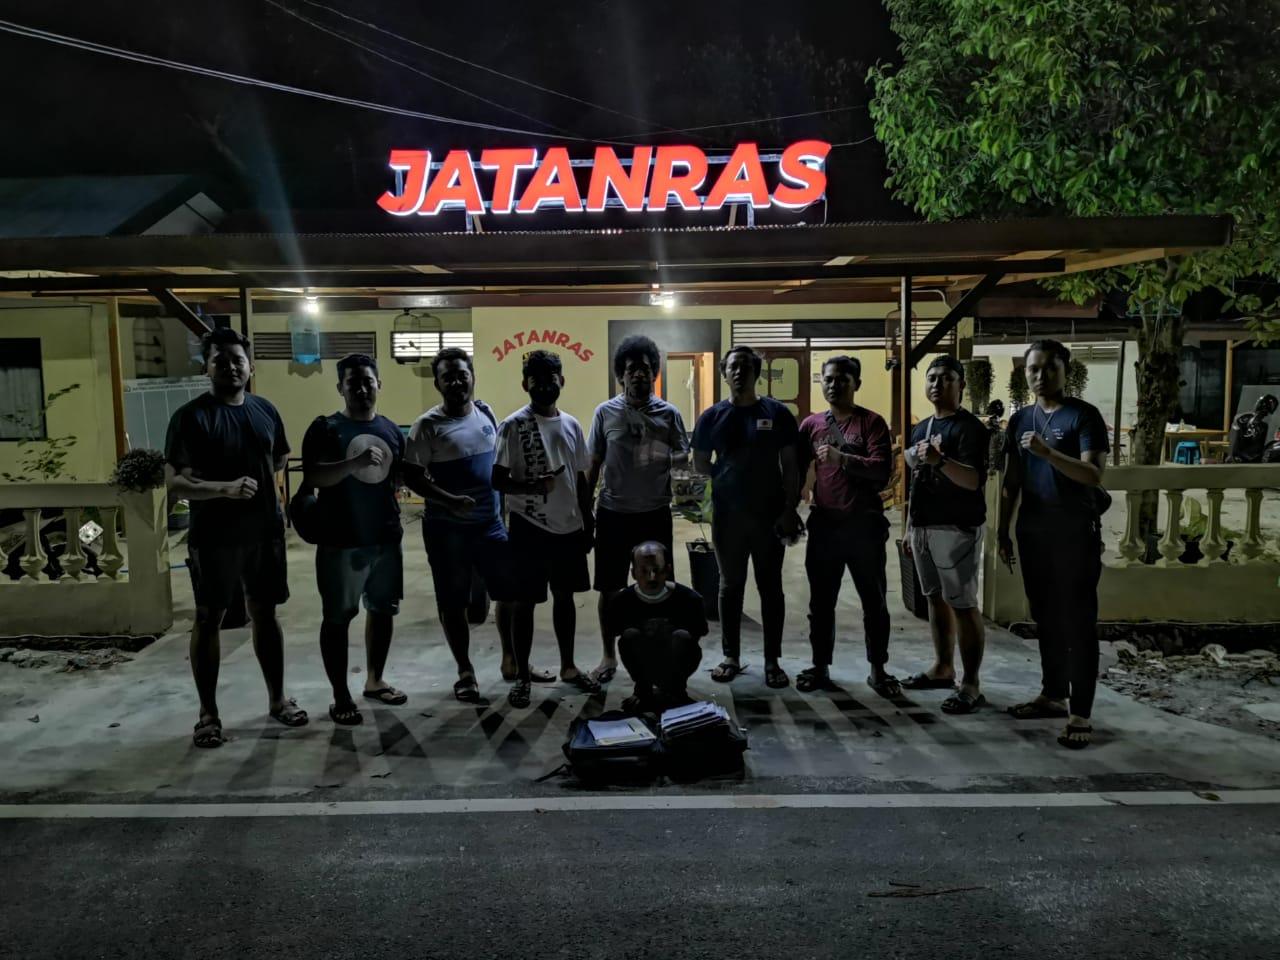 Pelaku saat diamankan oleh tim Jatanras Polresta Palangka Raya